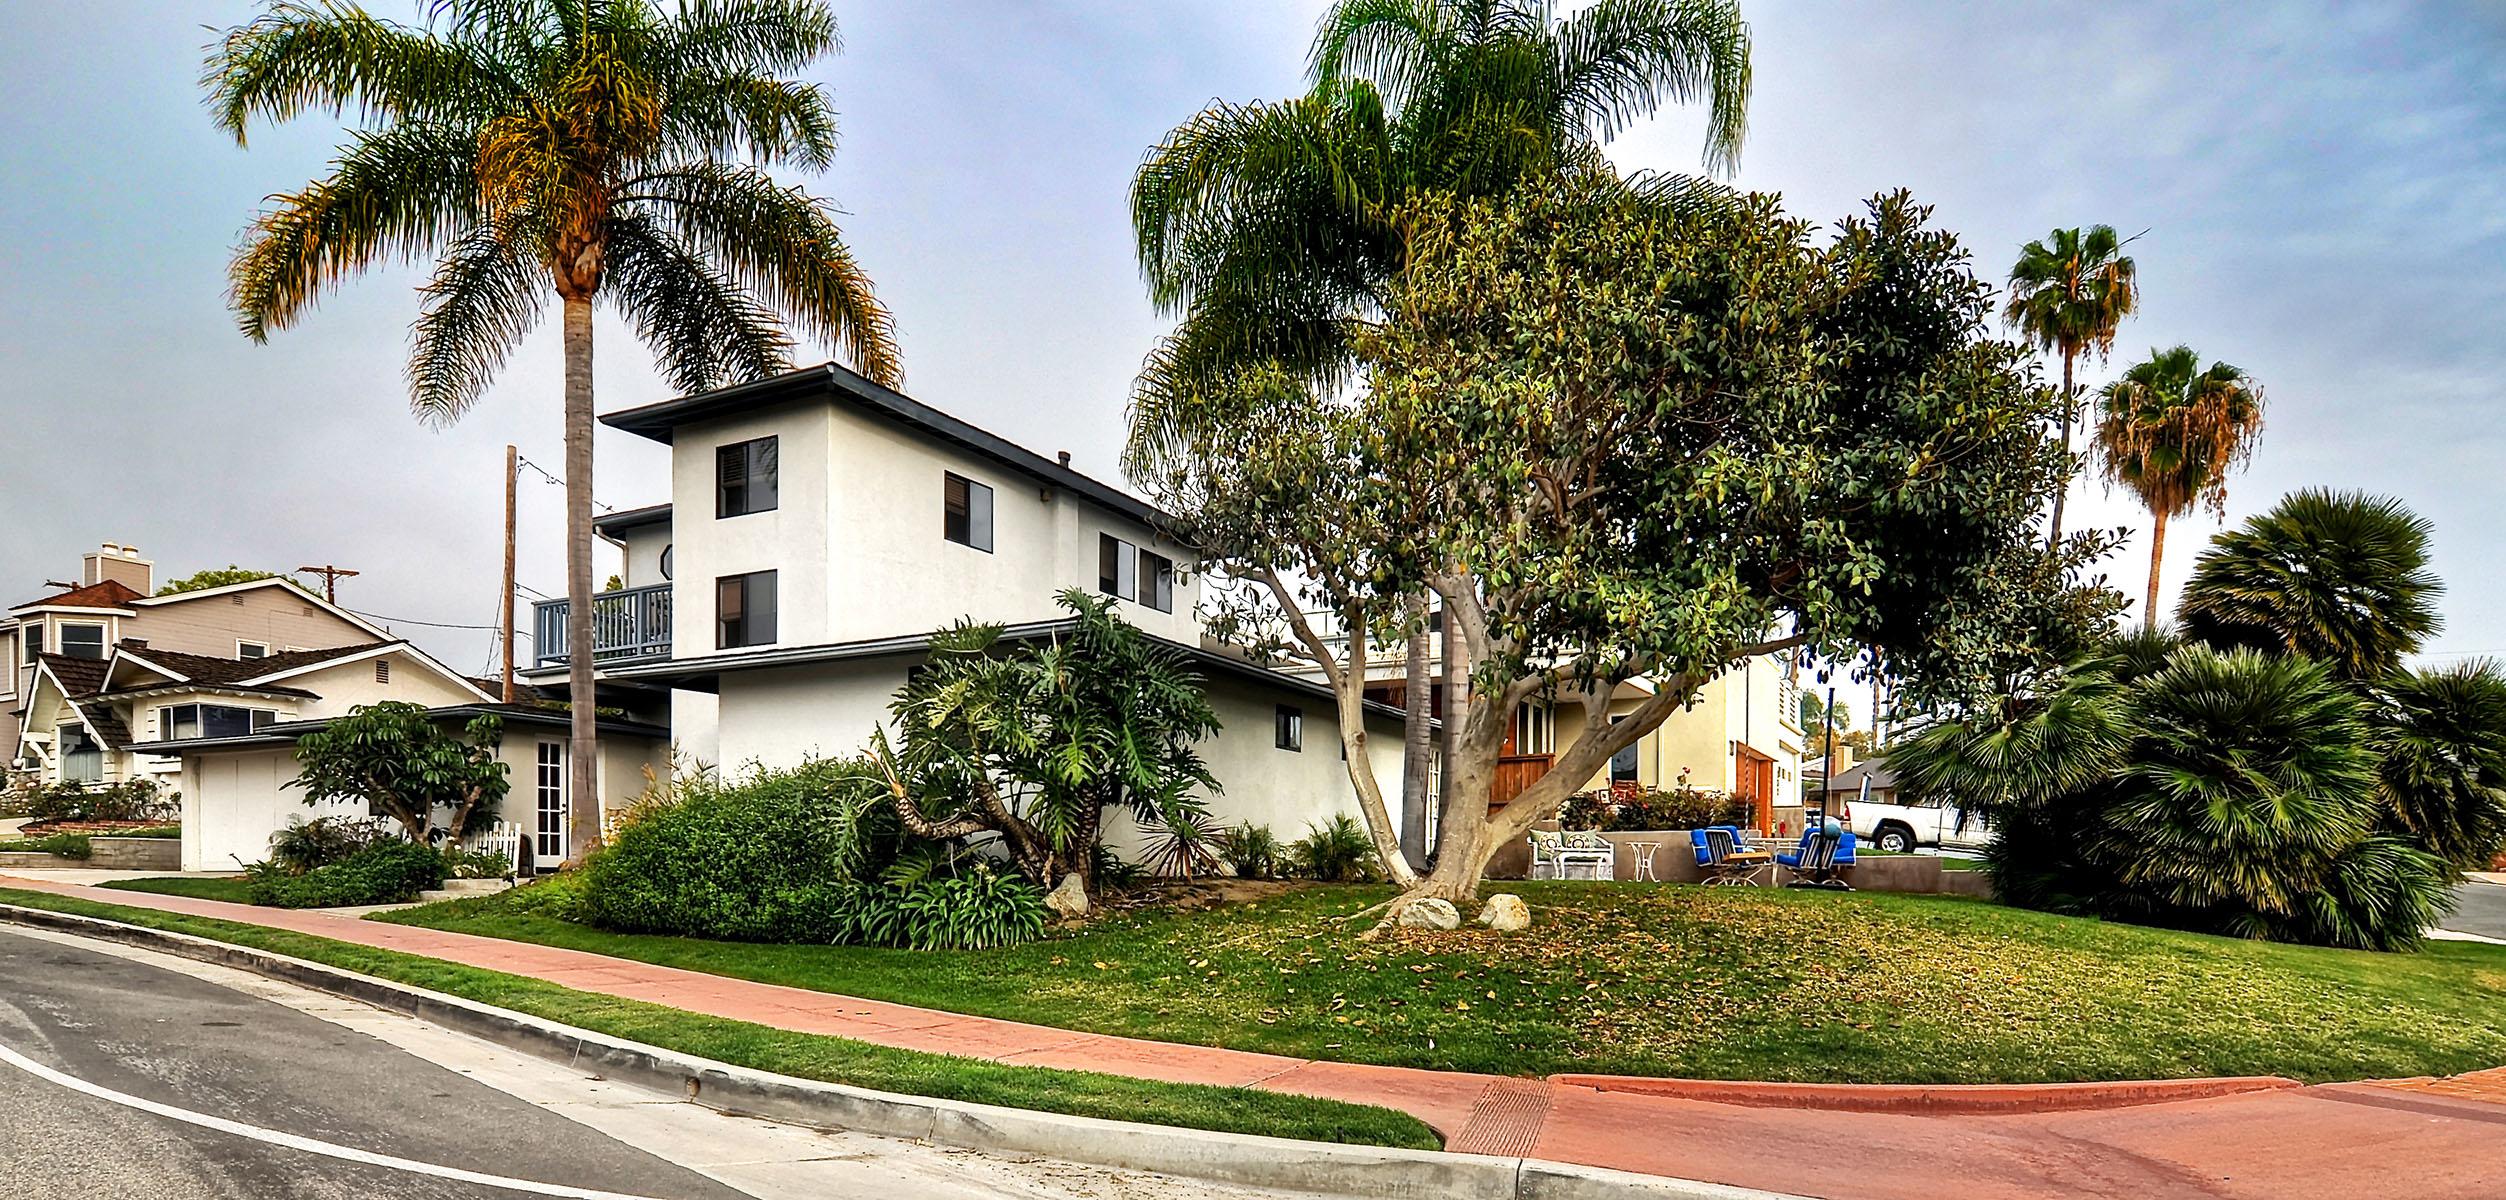 Single Family Home for Sale at San Clemente 237 W. Avenida Valencia San Clemente, California 92672 United States